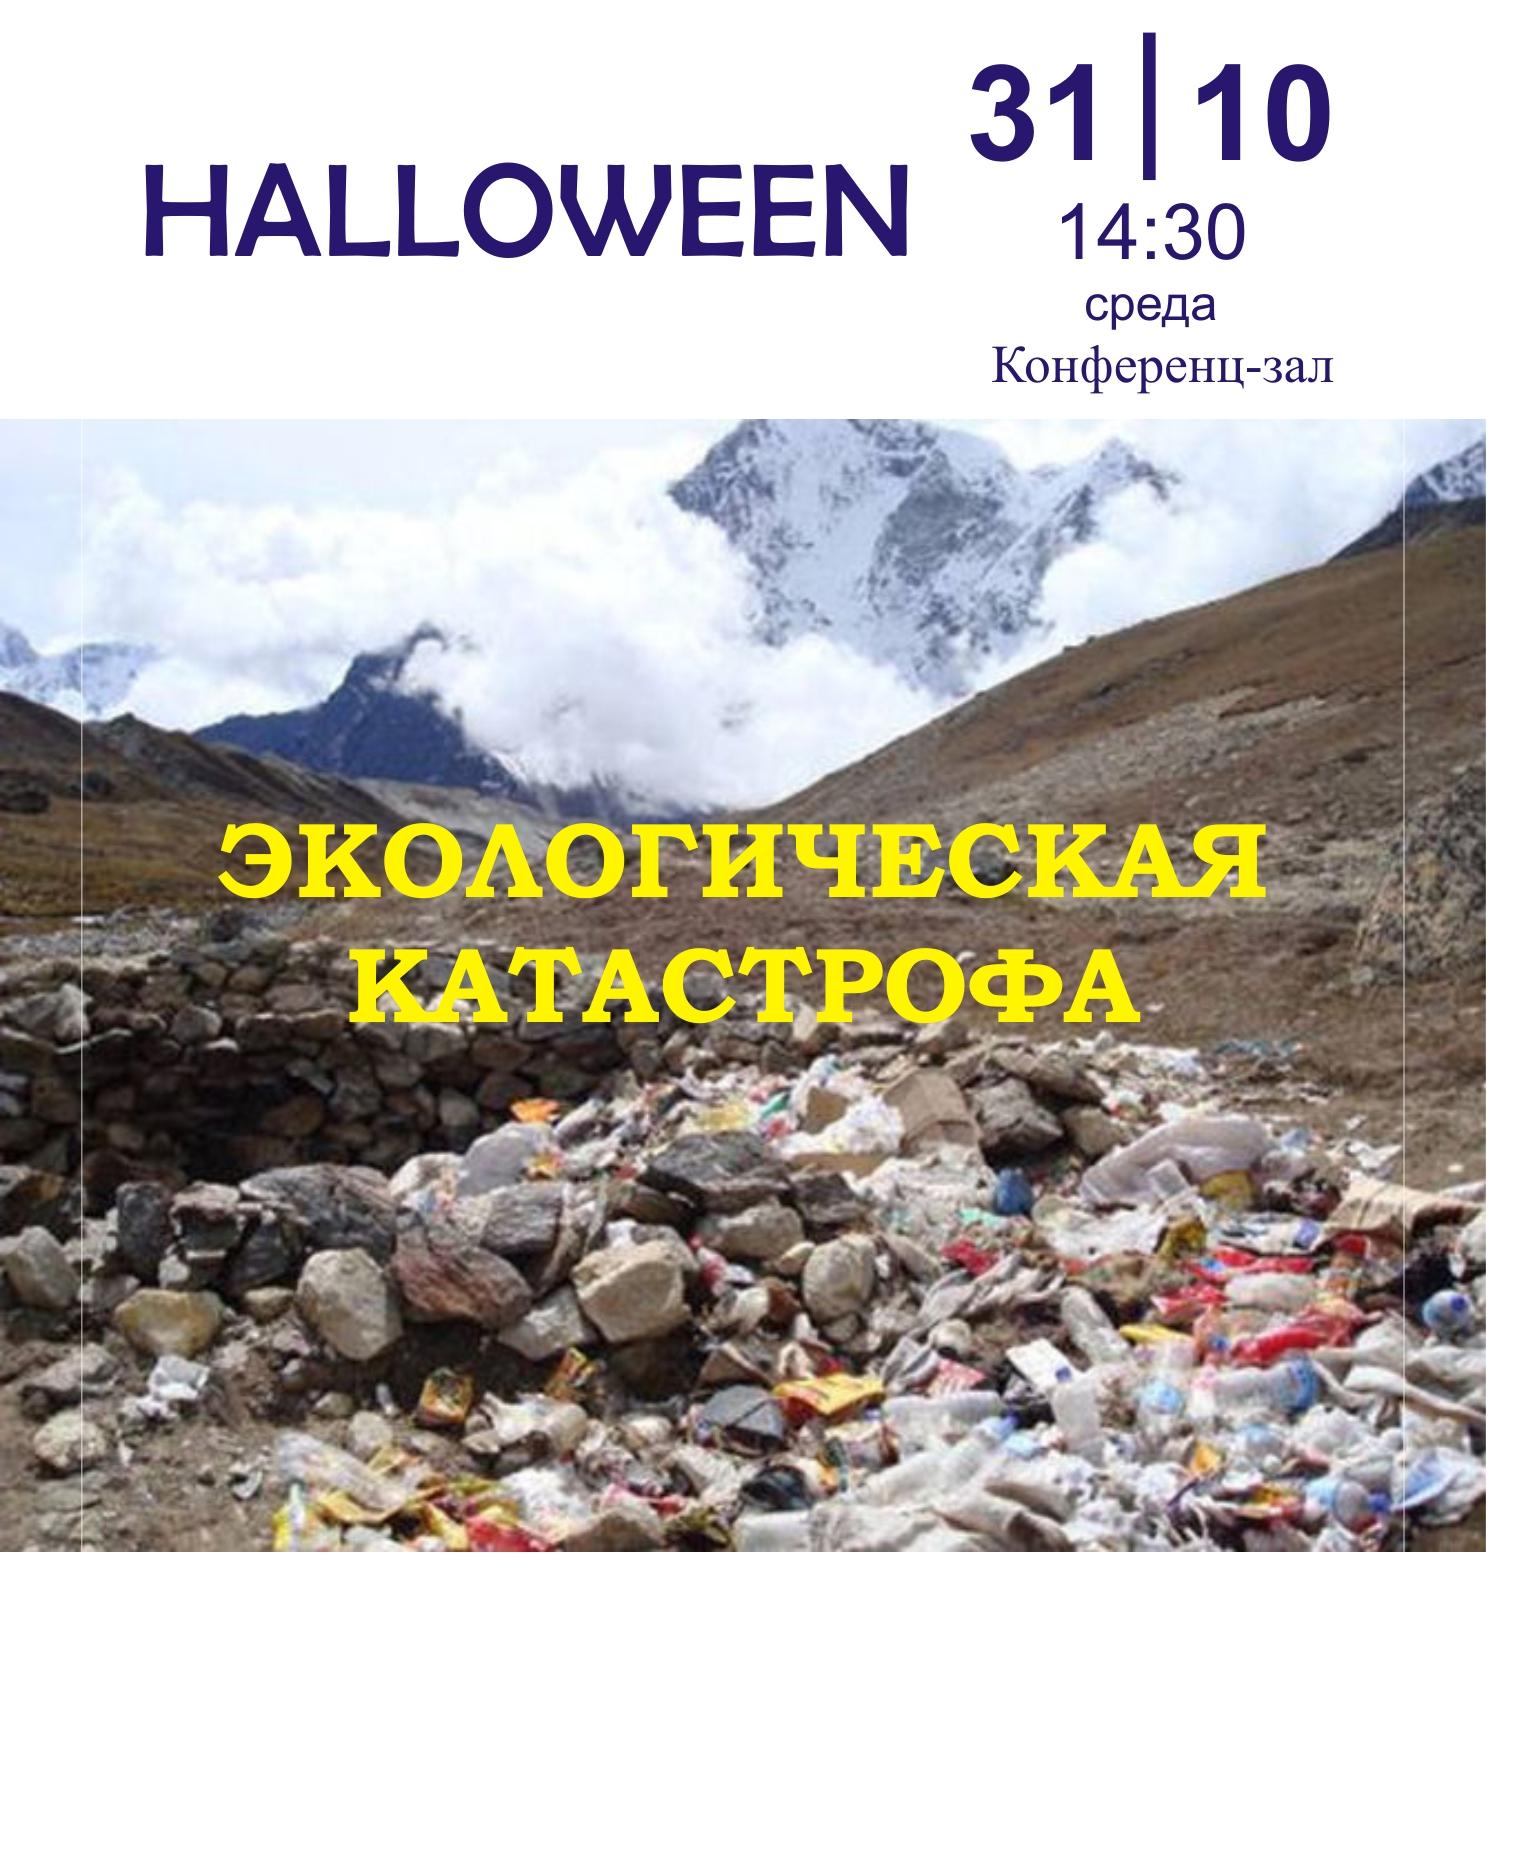 Halloween 20182